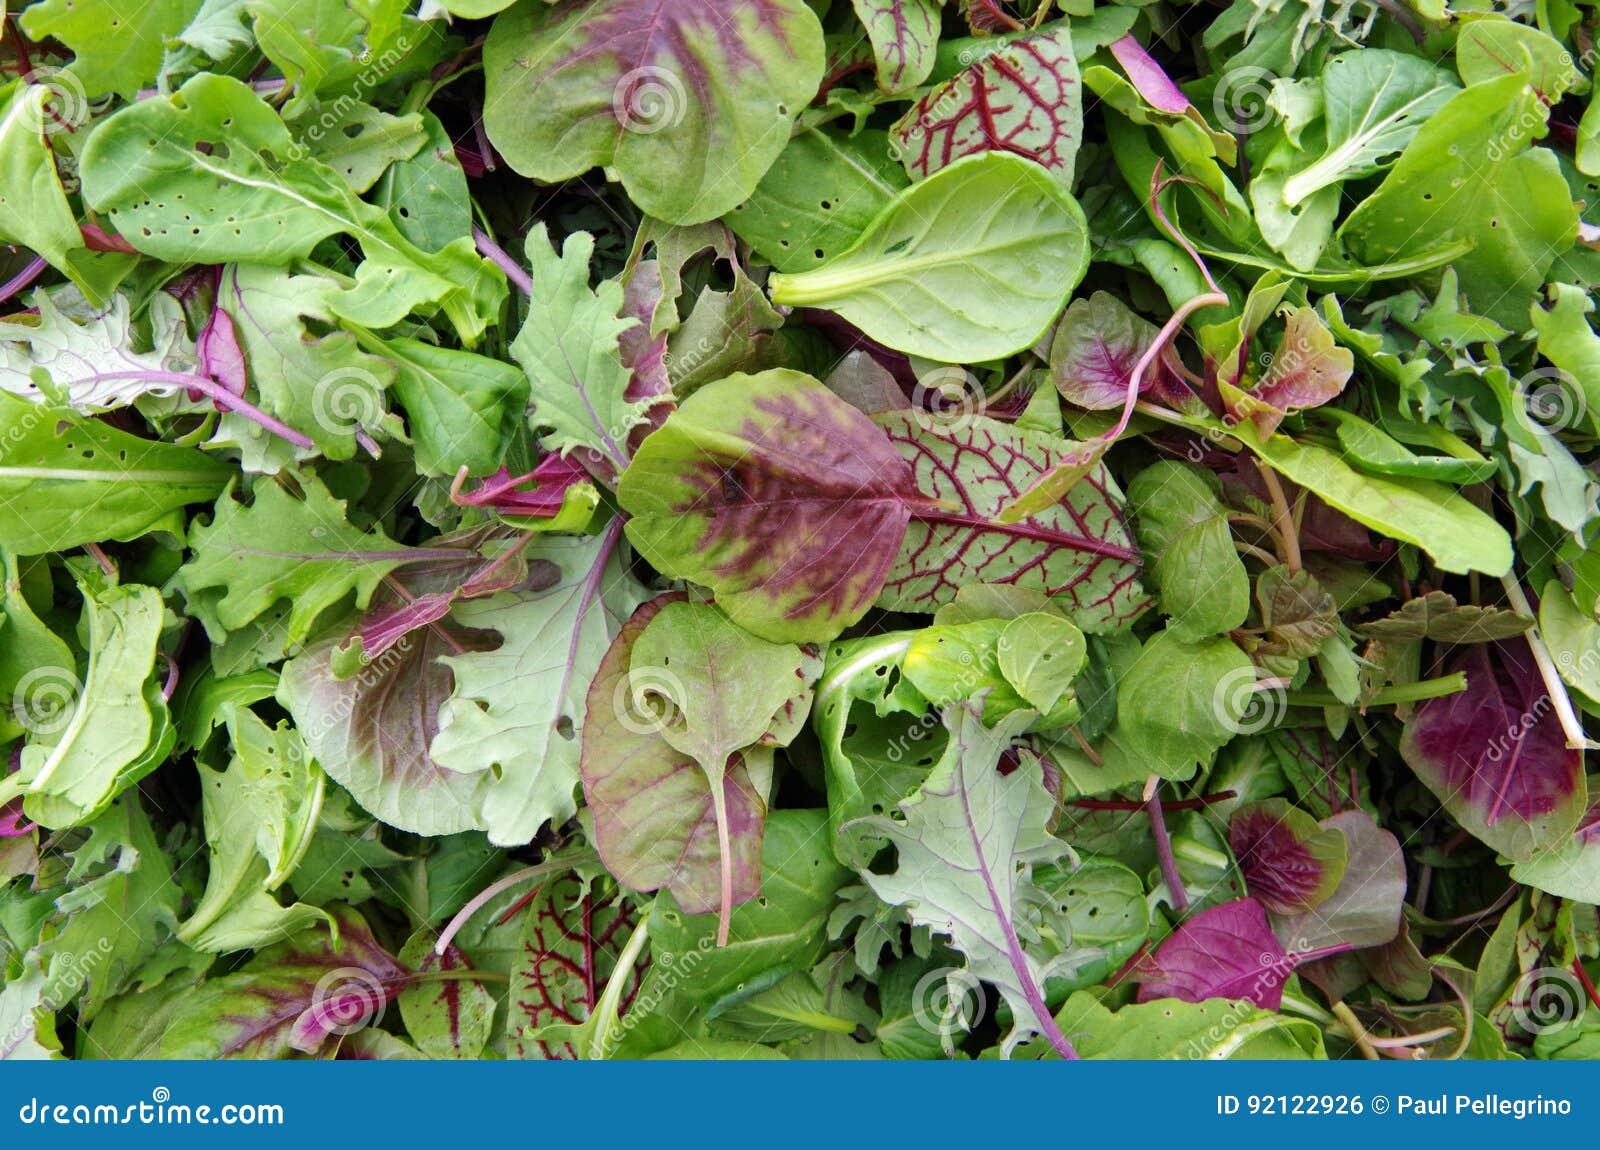 Salad micro greens